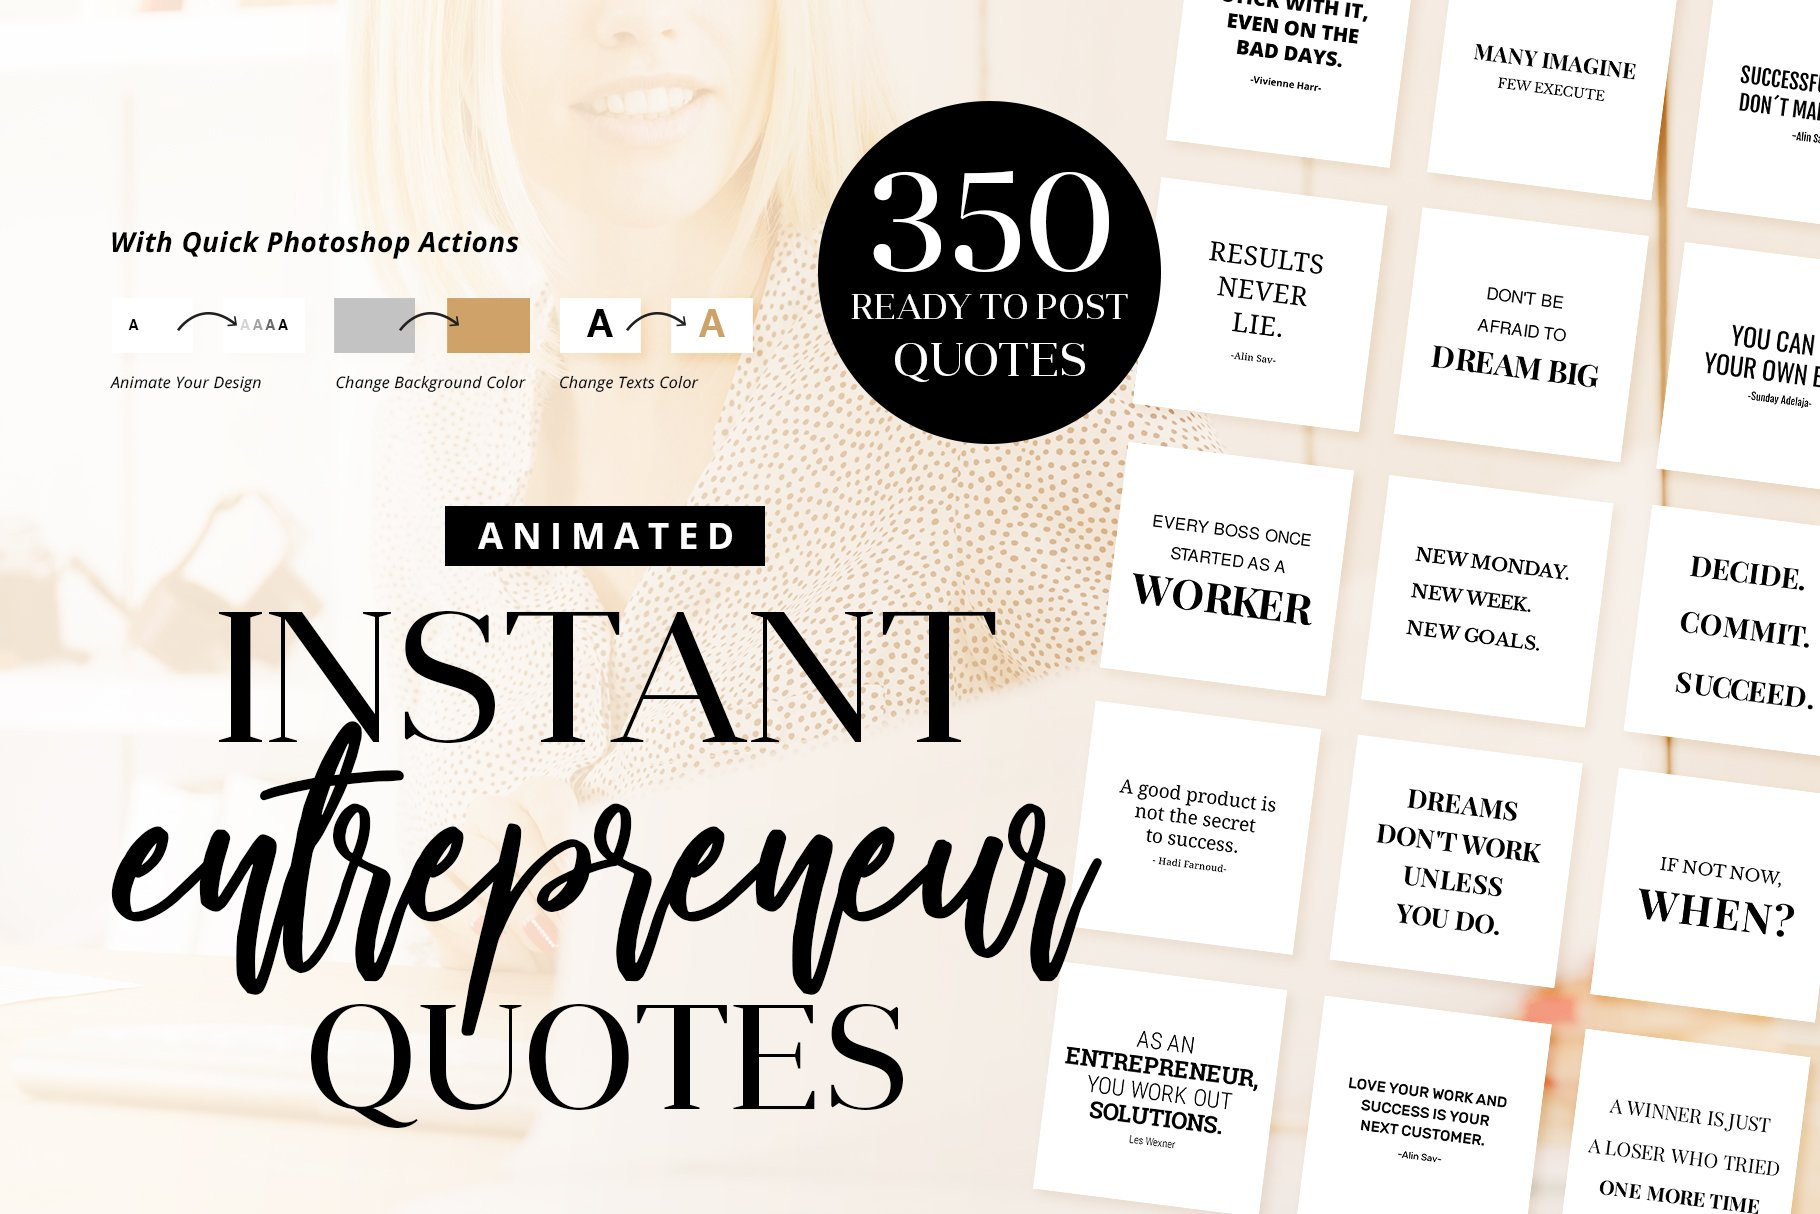 animated-instant-entrepreneur-quotes-.jpg